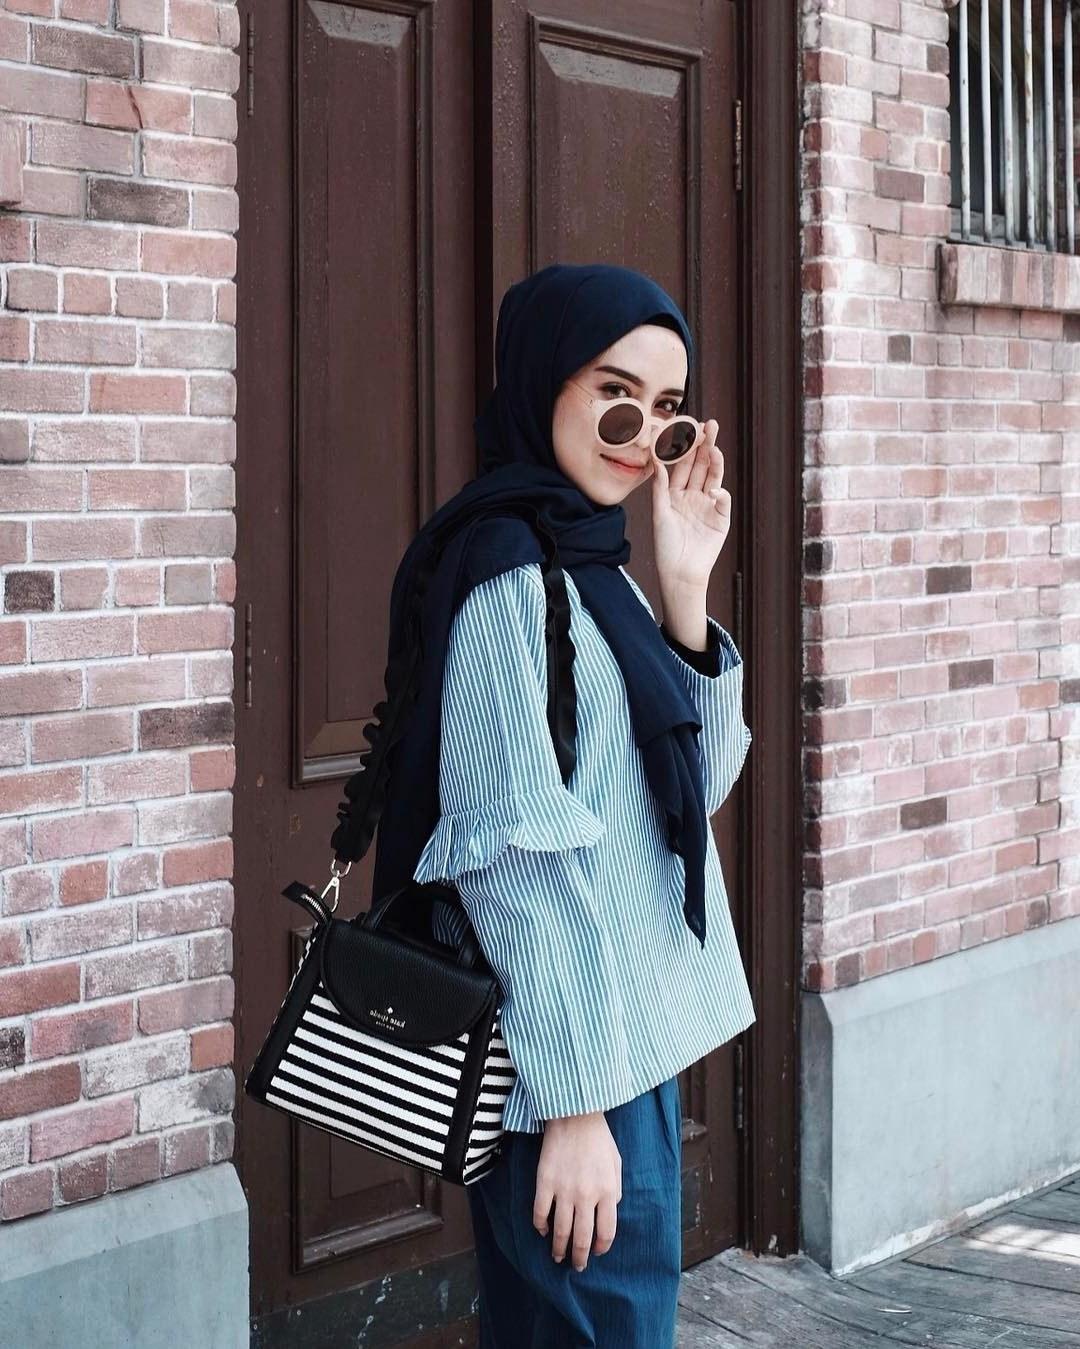 Ide Fashion Muslim Terbaru Bqdd 30 Model Baju Muslim Modis Untuk Remaja Masa Kini